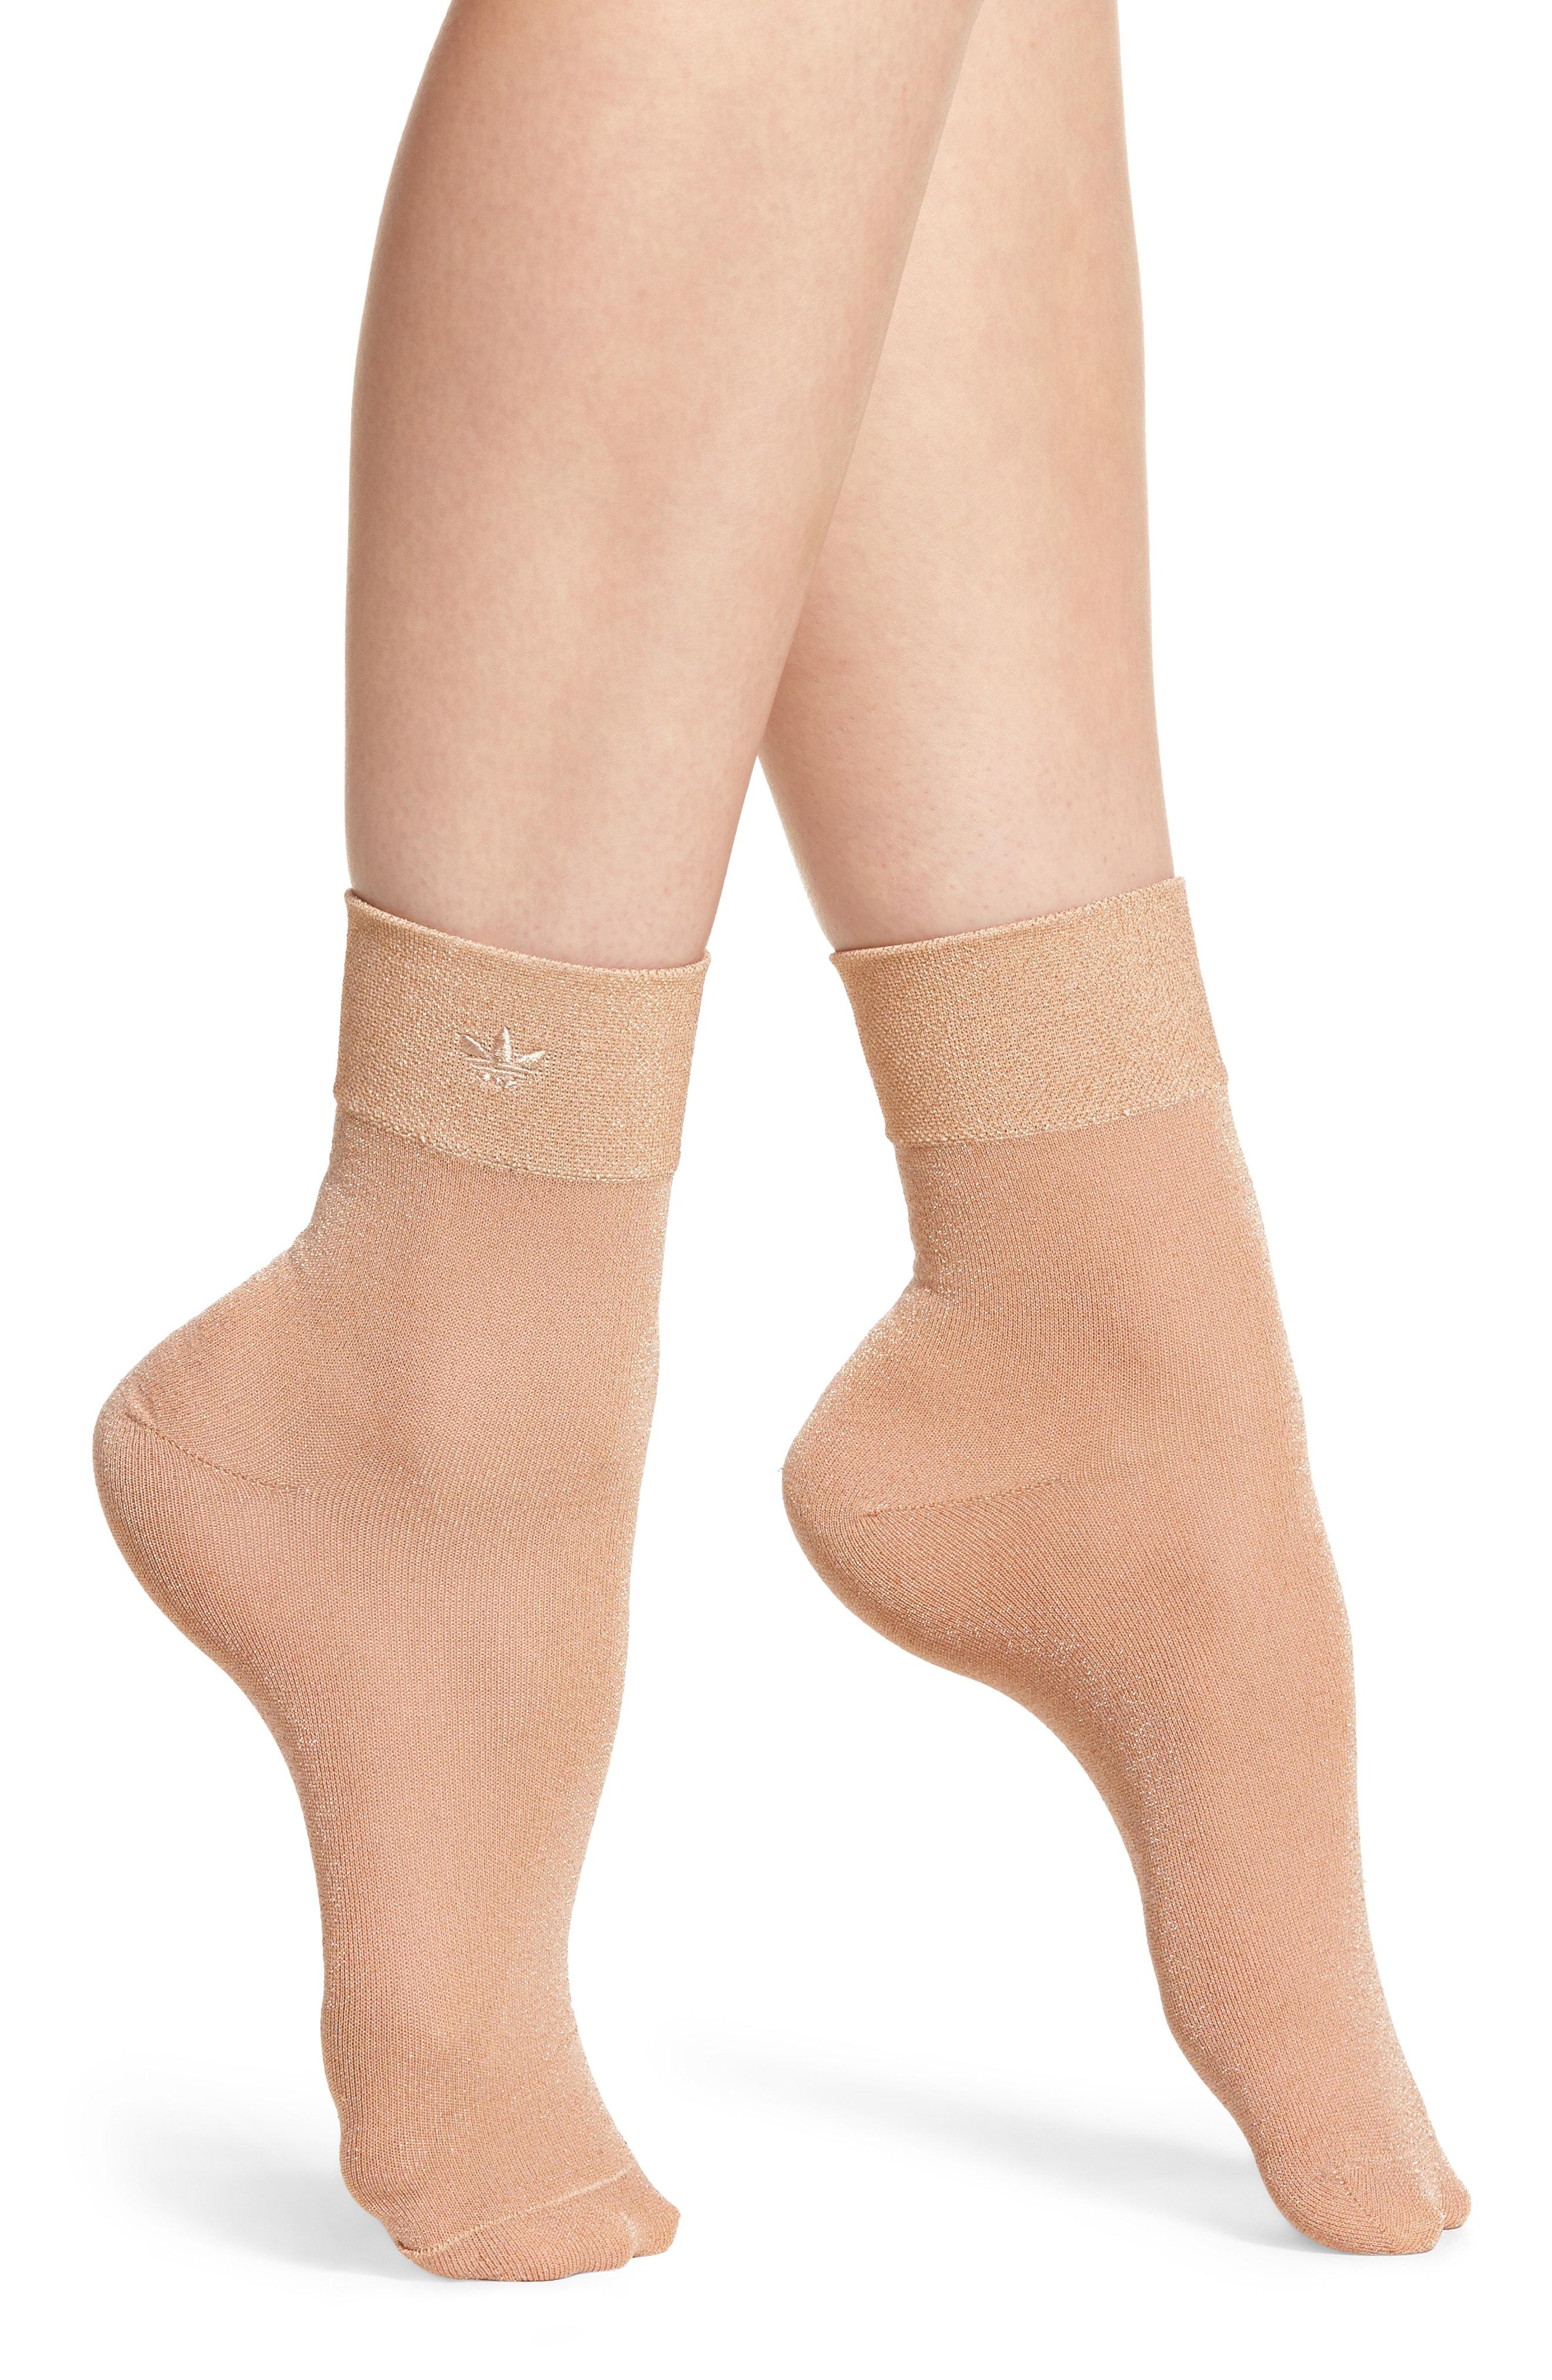 adidas Originals Metallic Ankle Socks